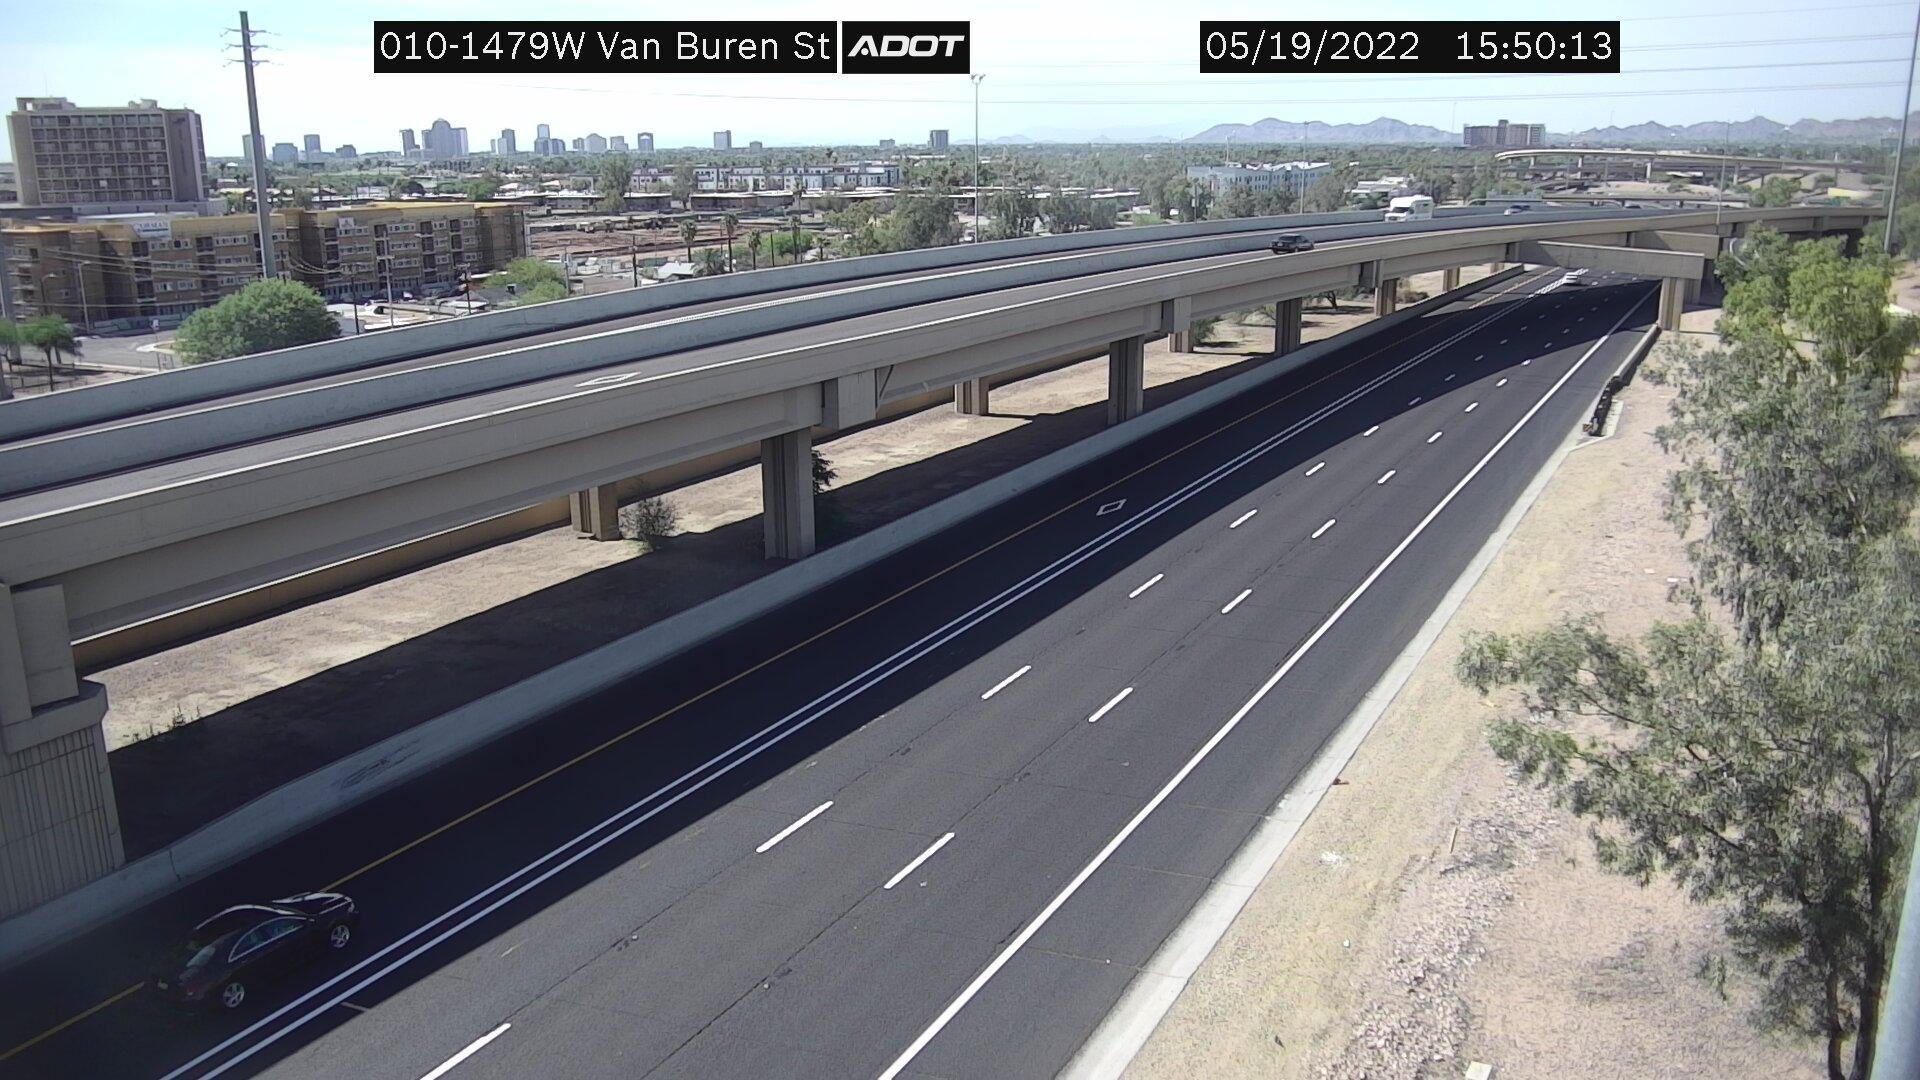 Van Buren WB (I10) (024) - Phoenix and Arizona